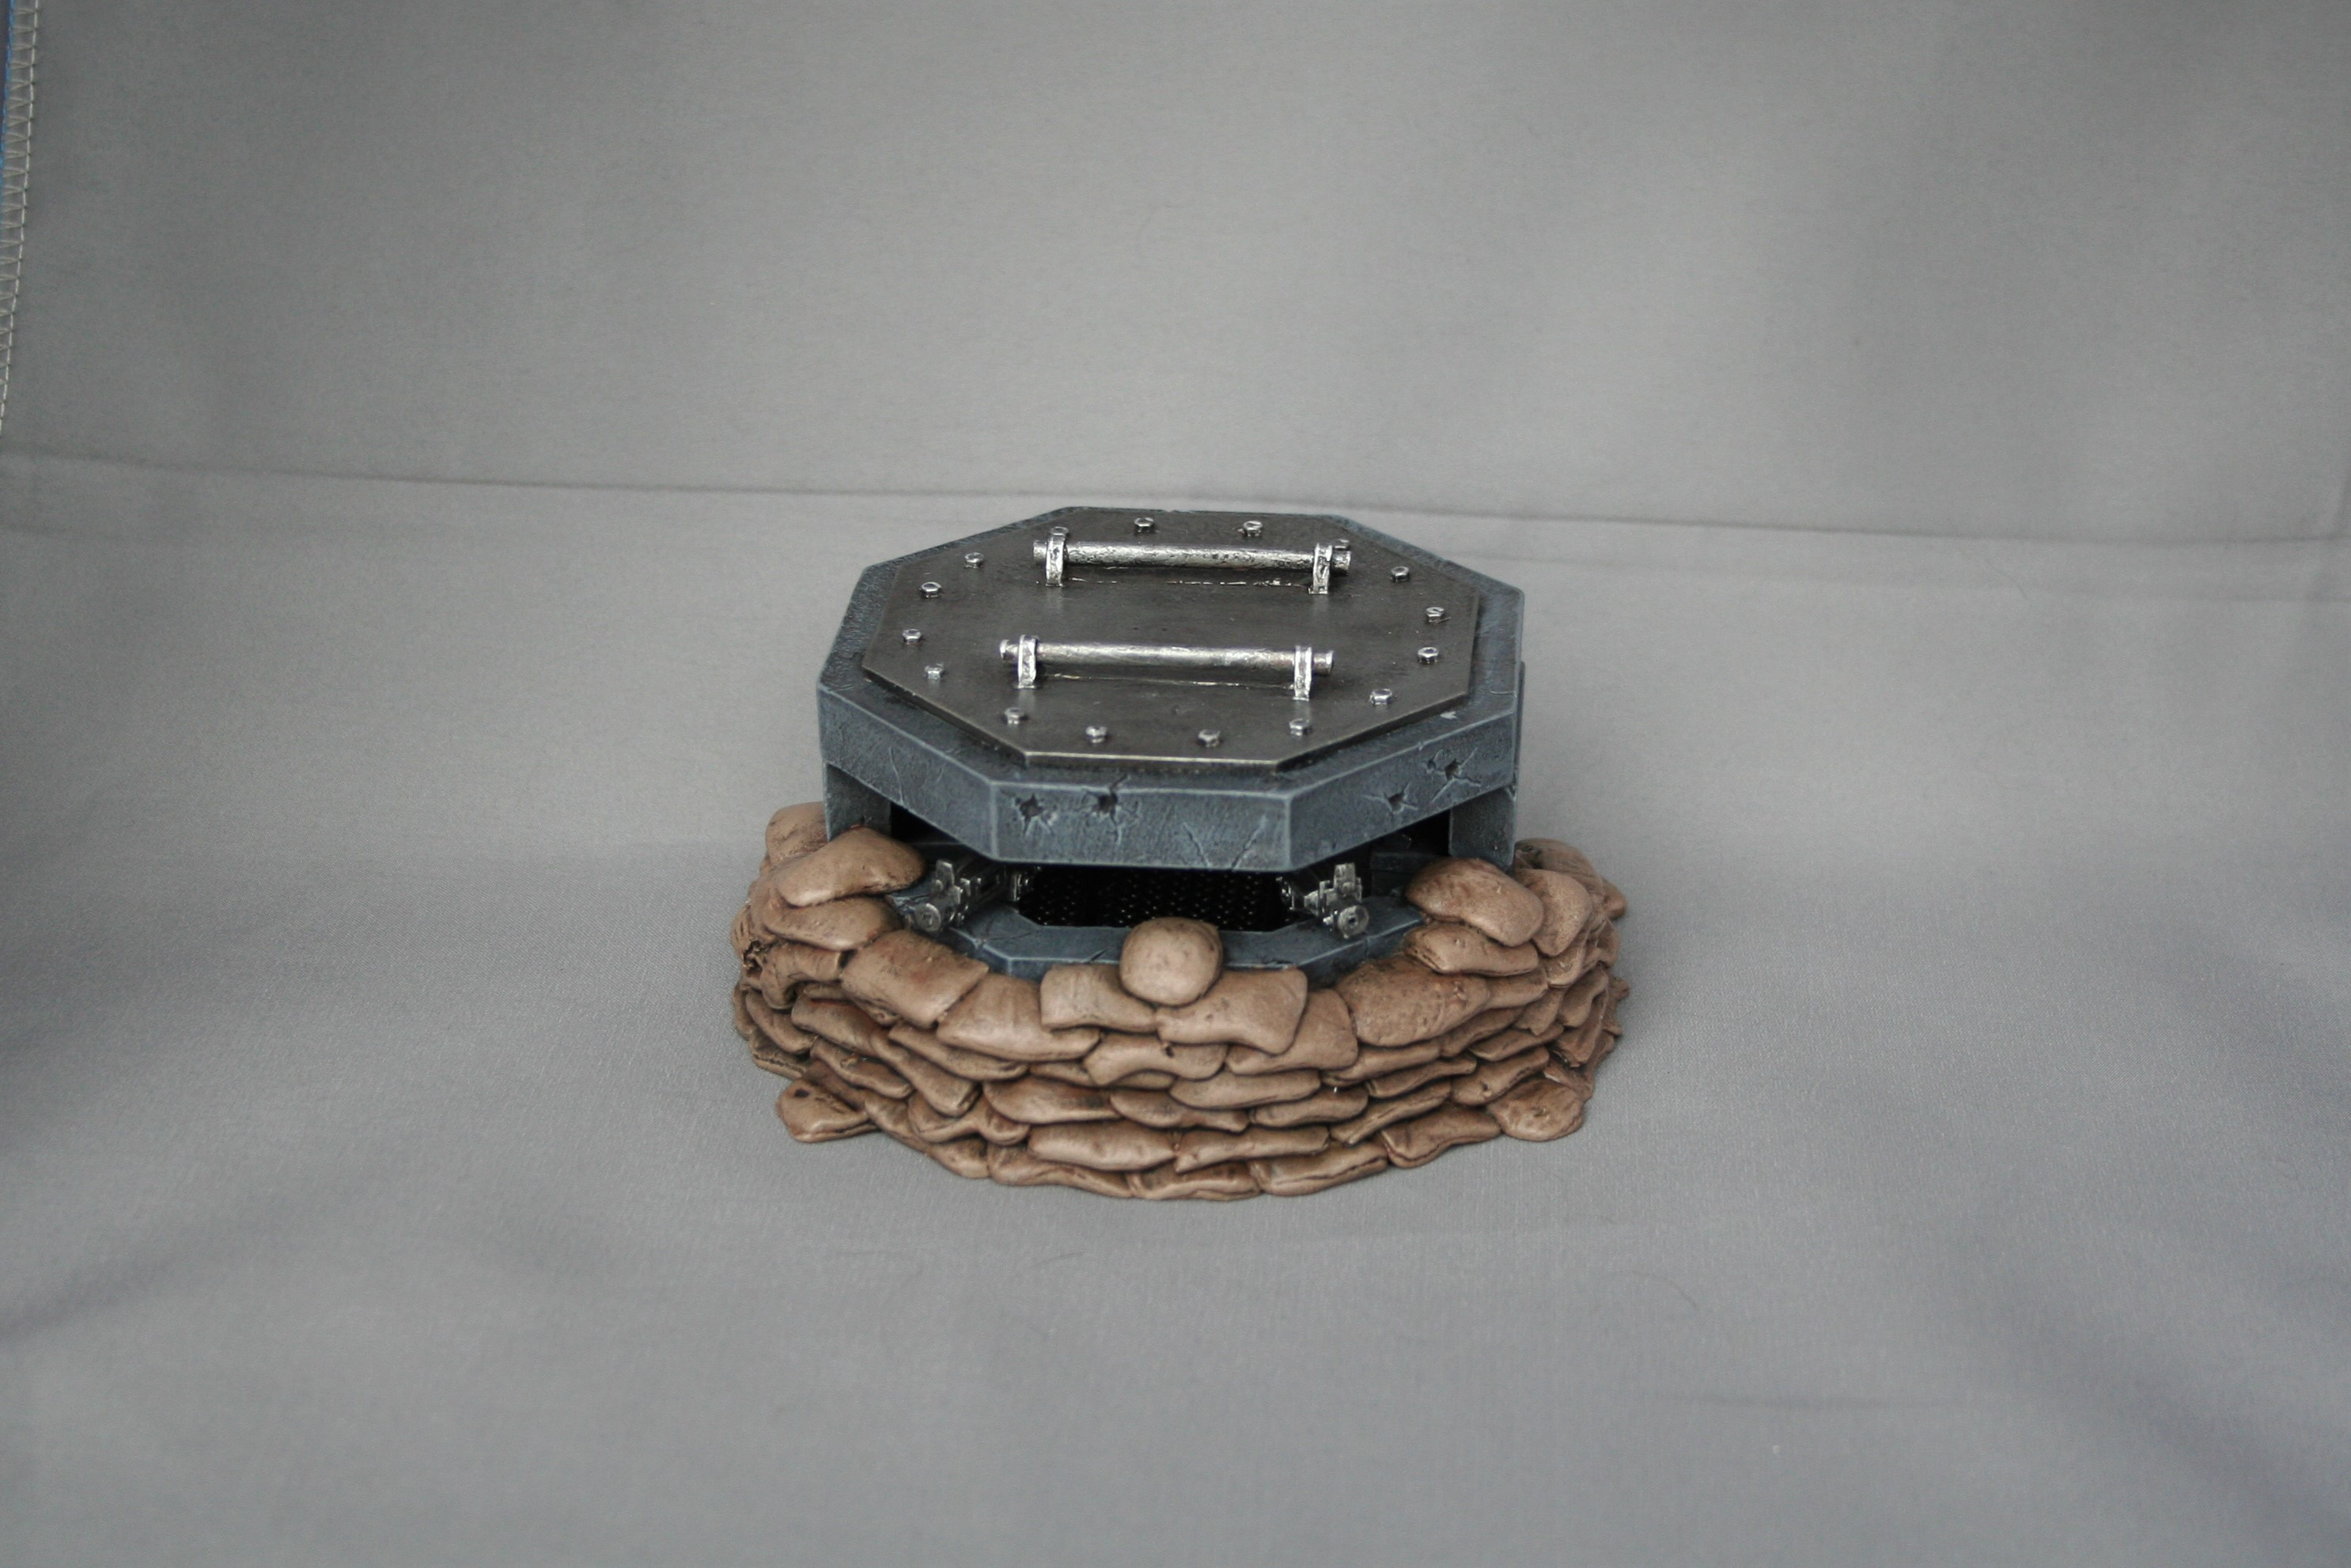 Forge world bunker